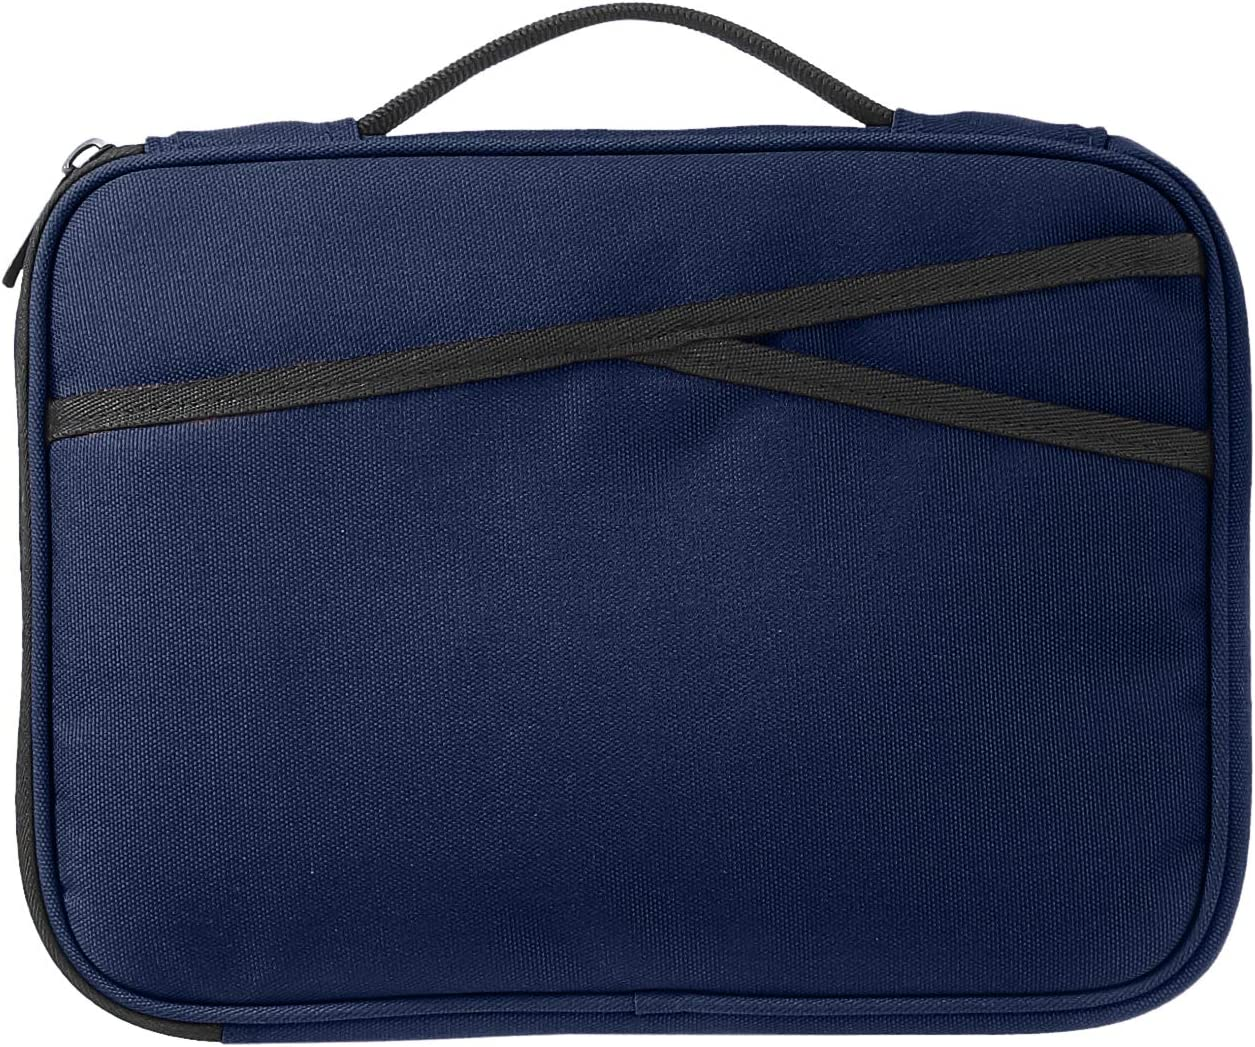 AmazonBasics Tablet Sleeve Case Bag - 10-Inch, Navy